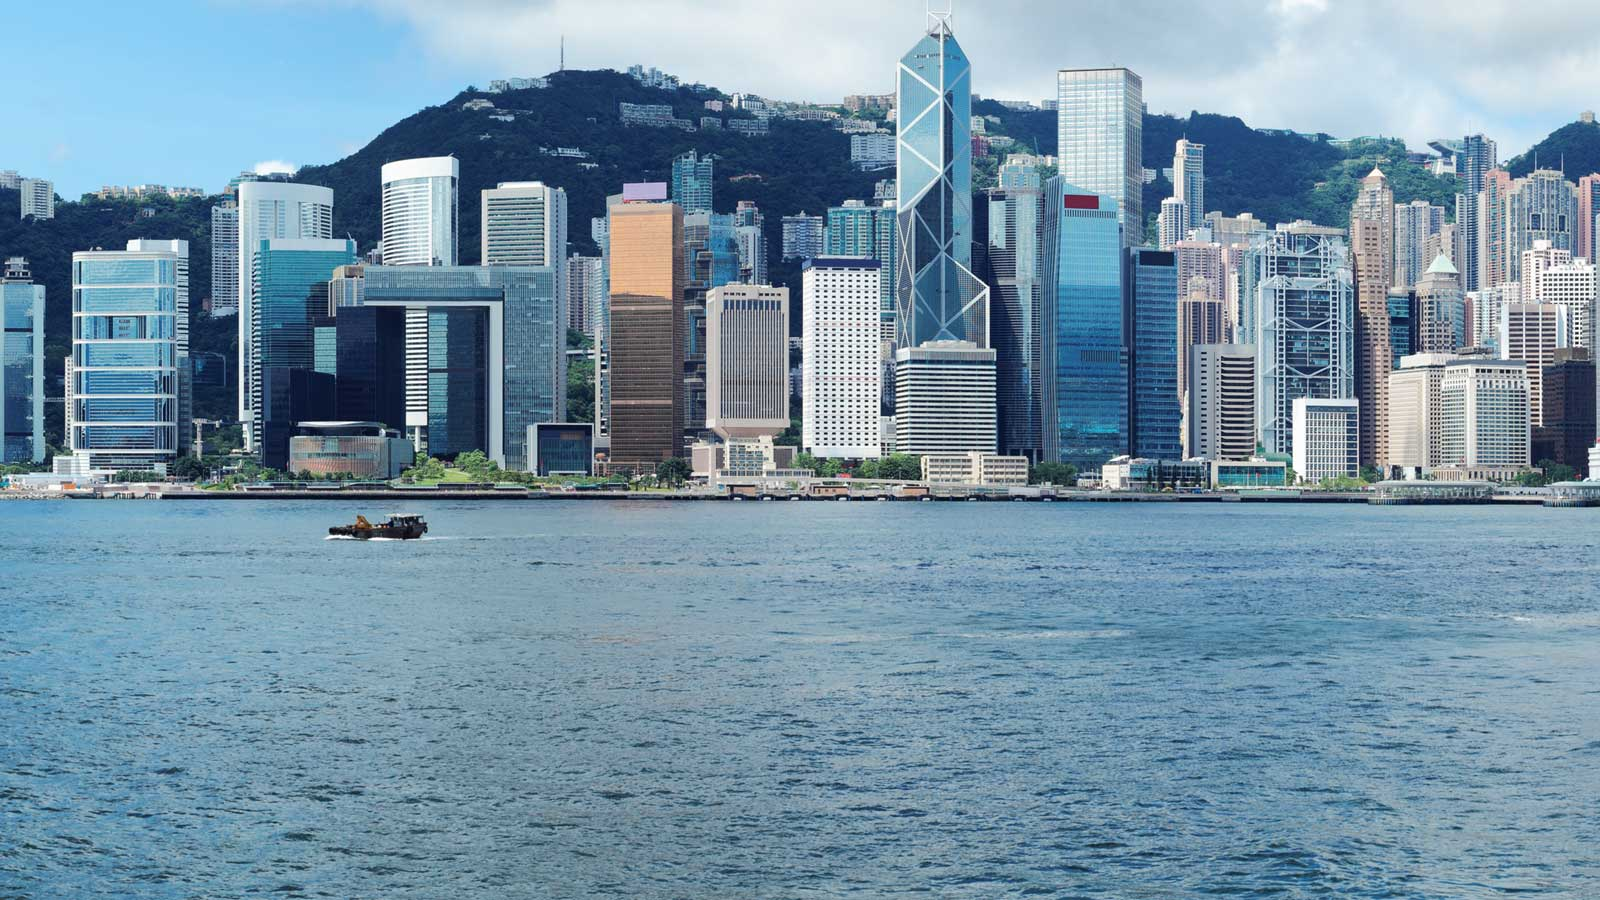 Hong Kong'daki Türk Firmaları